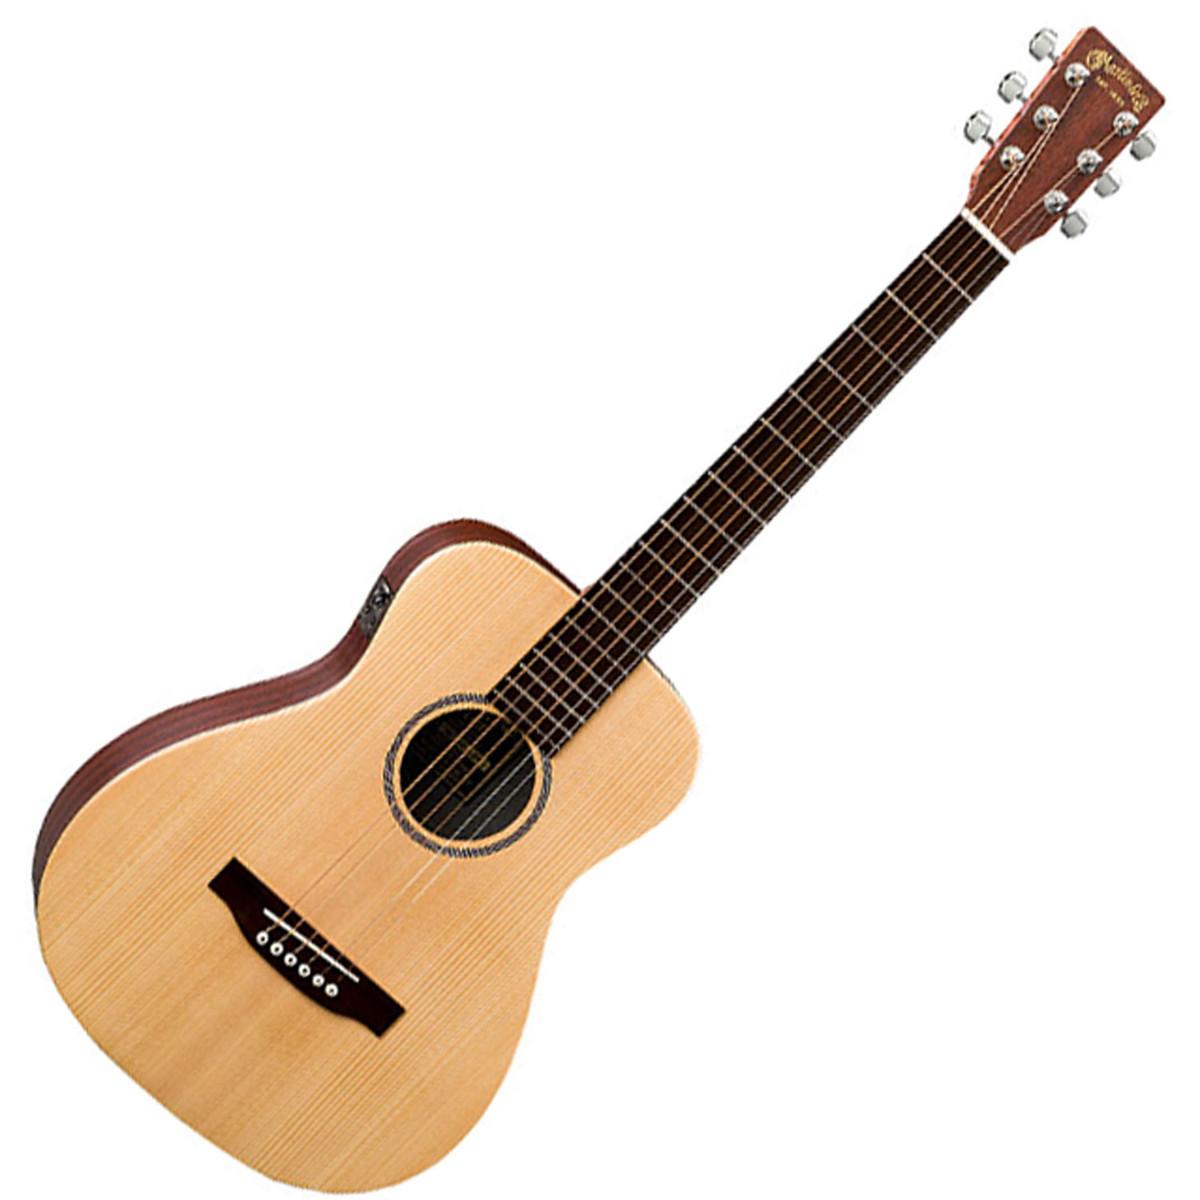 martin lx1e little martin guitare lectro acoustique. Black Bedroom Furniture Sets. Home Design Ideas